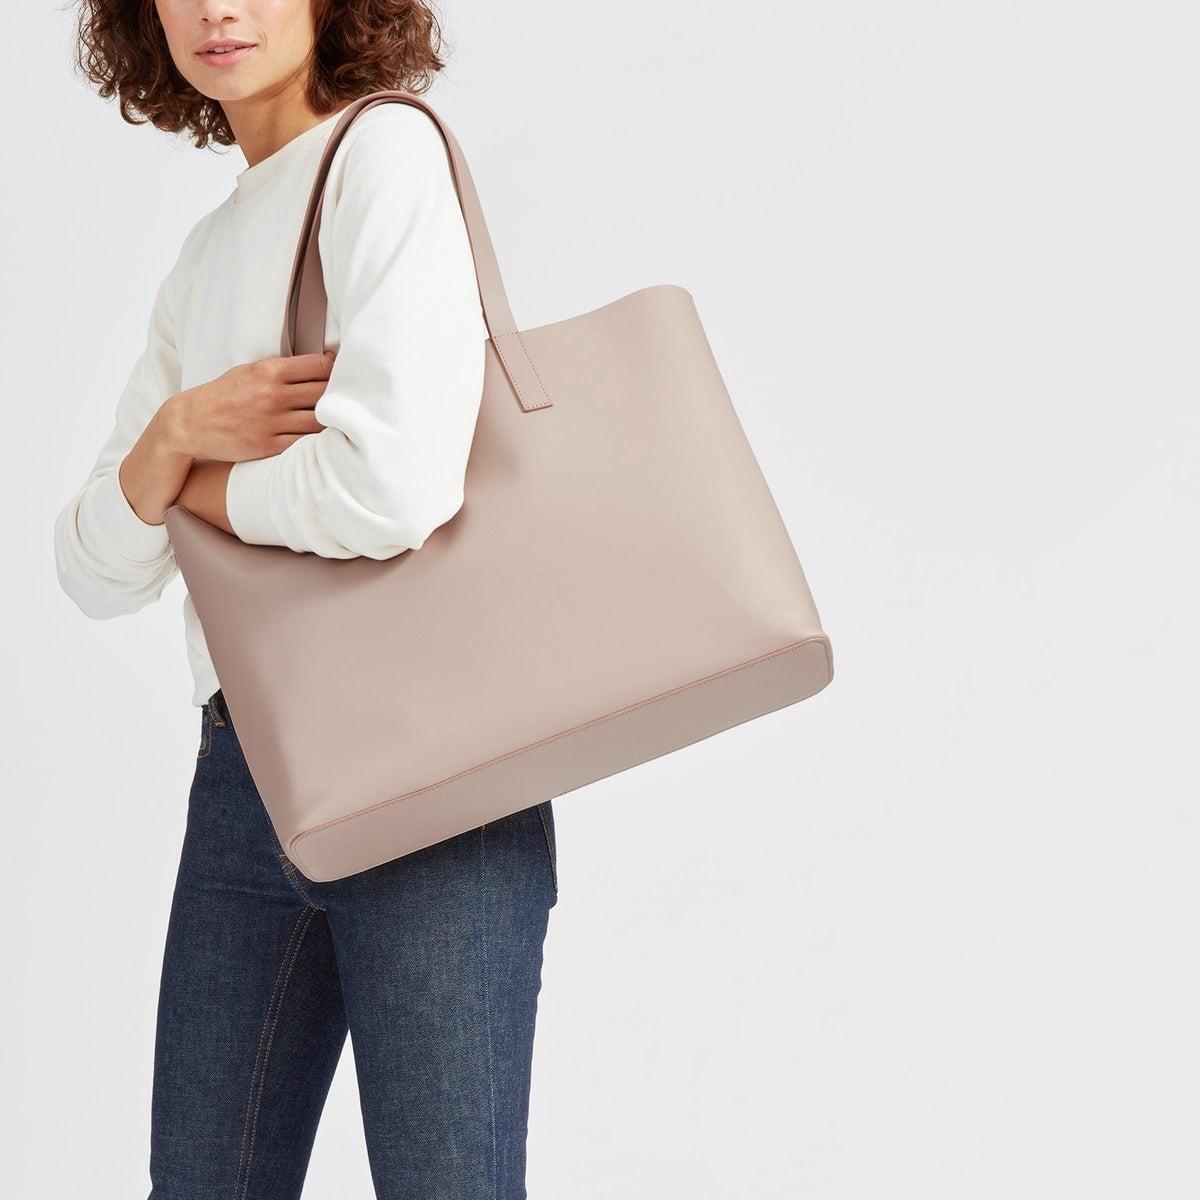 774a78dd46a6 Best Work Bags For Women 2019